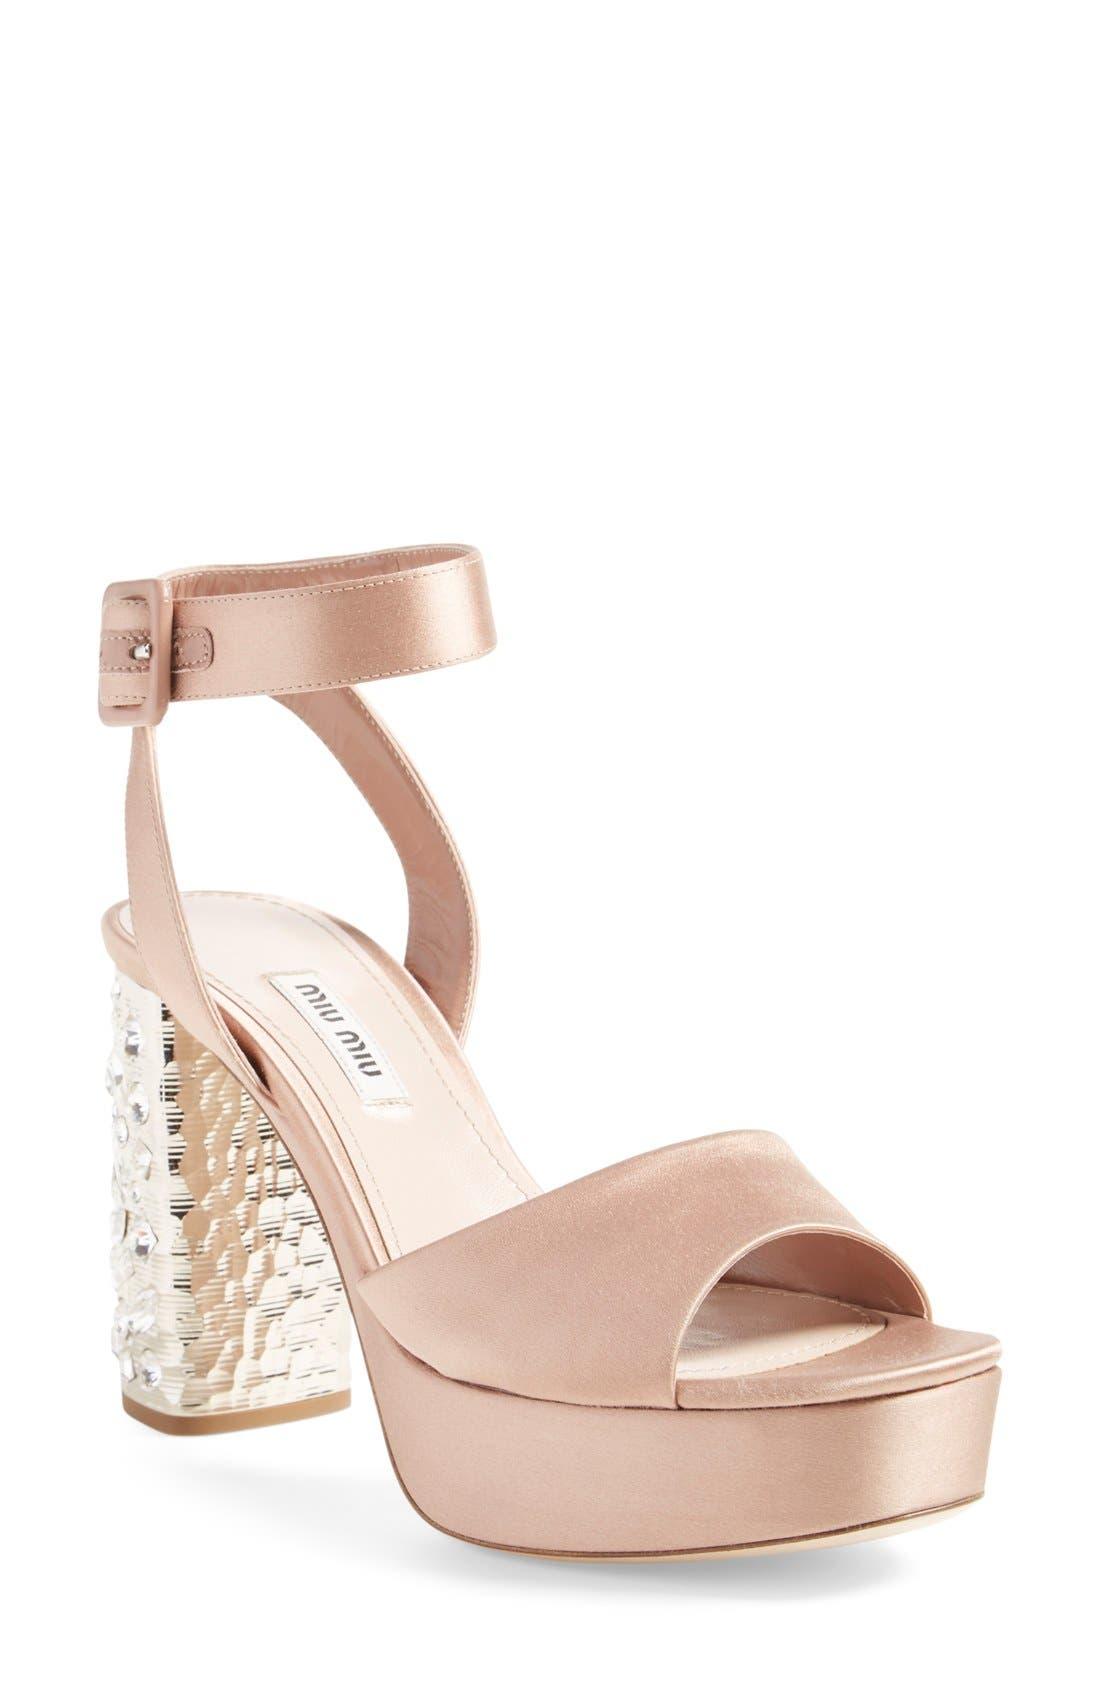 Main Image - Miu Miu Studded Block Heel Platform Sandal (Women) (Nordstrom Exclusive)